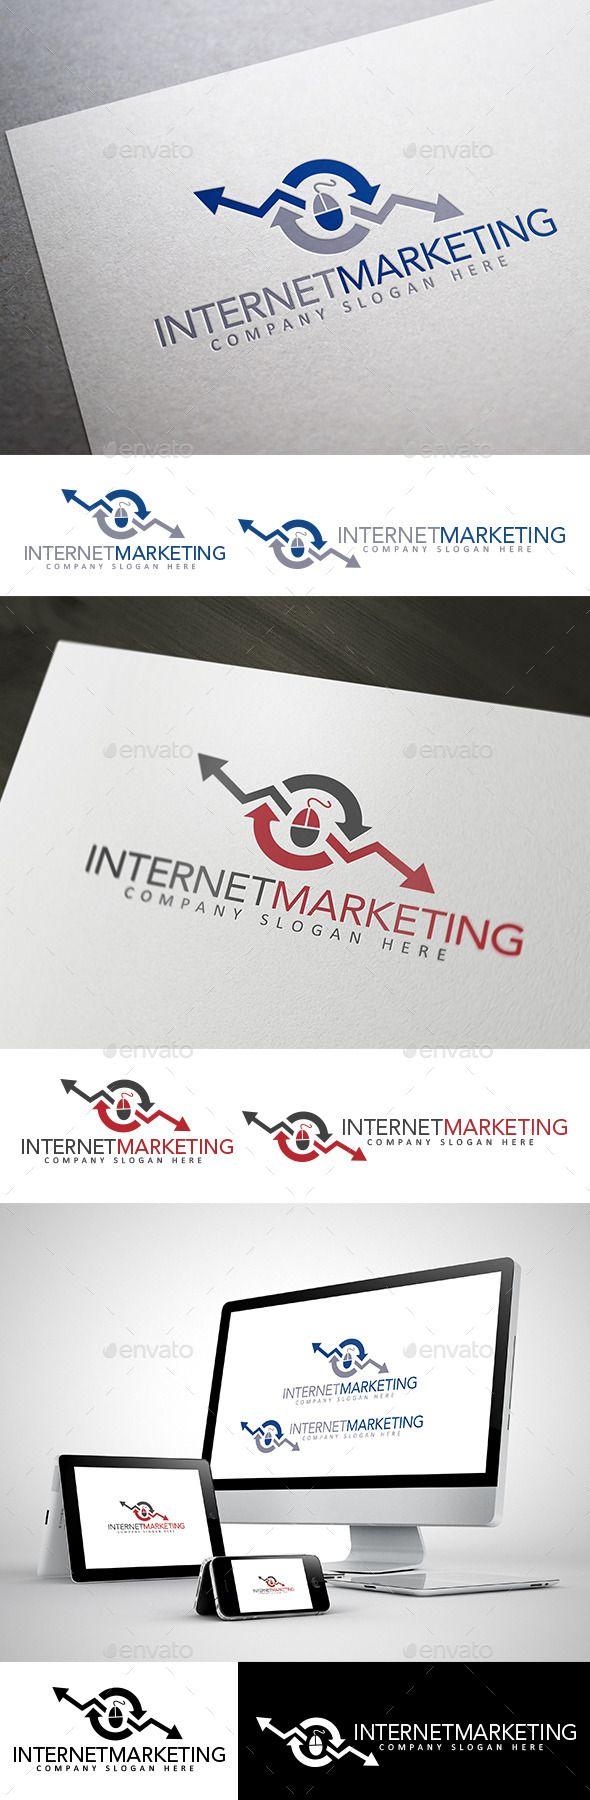 Internet Marketing Logo — Vector EPS #seo #marketing • Available here → https://graphicriver.net/item/internet-marketing-logo/10412906?ref=pxcr